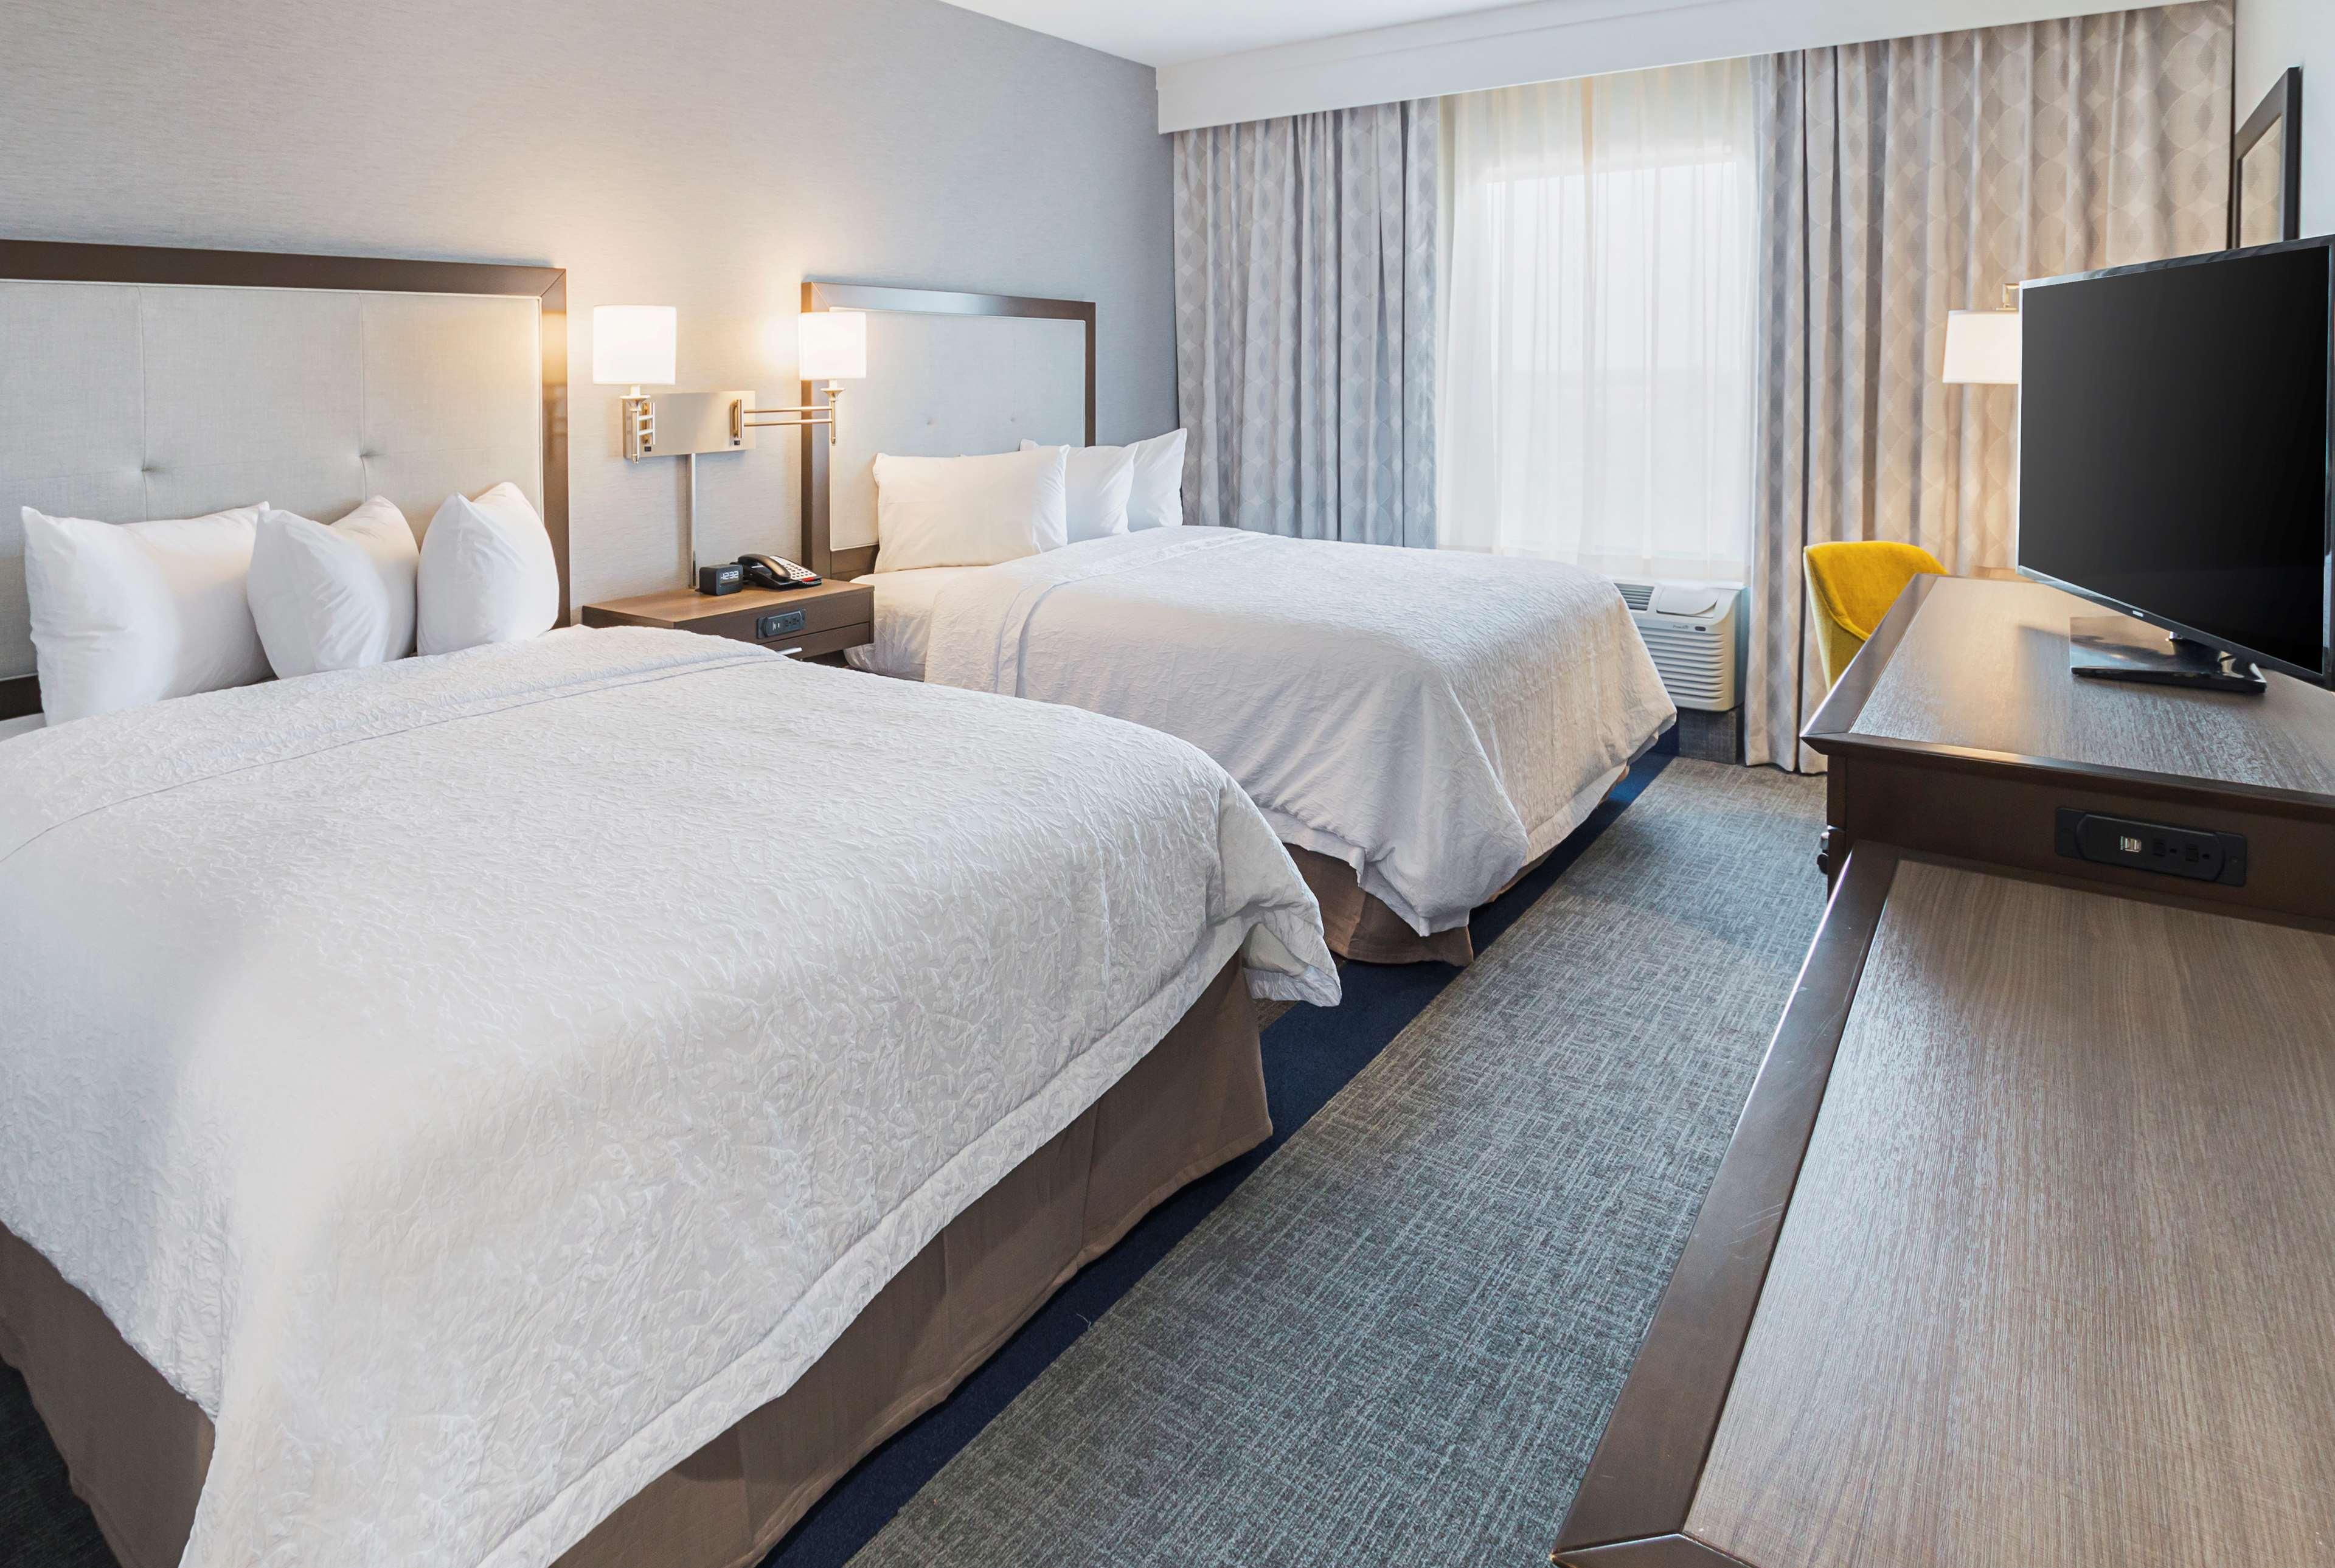 Hampton Inn & Suites Colleyville DFW West image 24